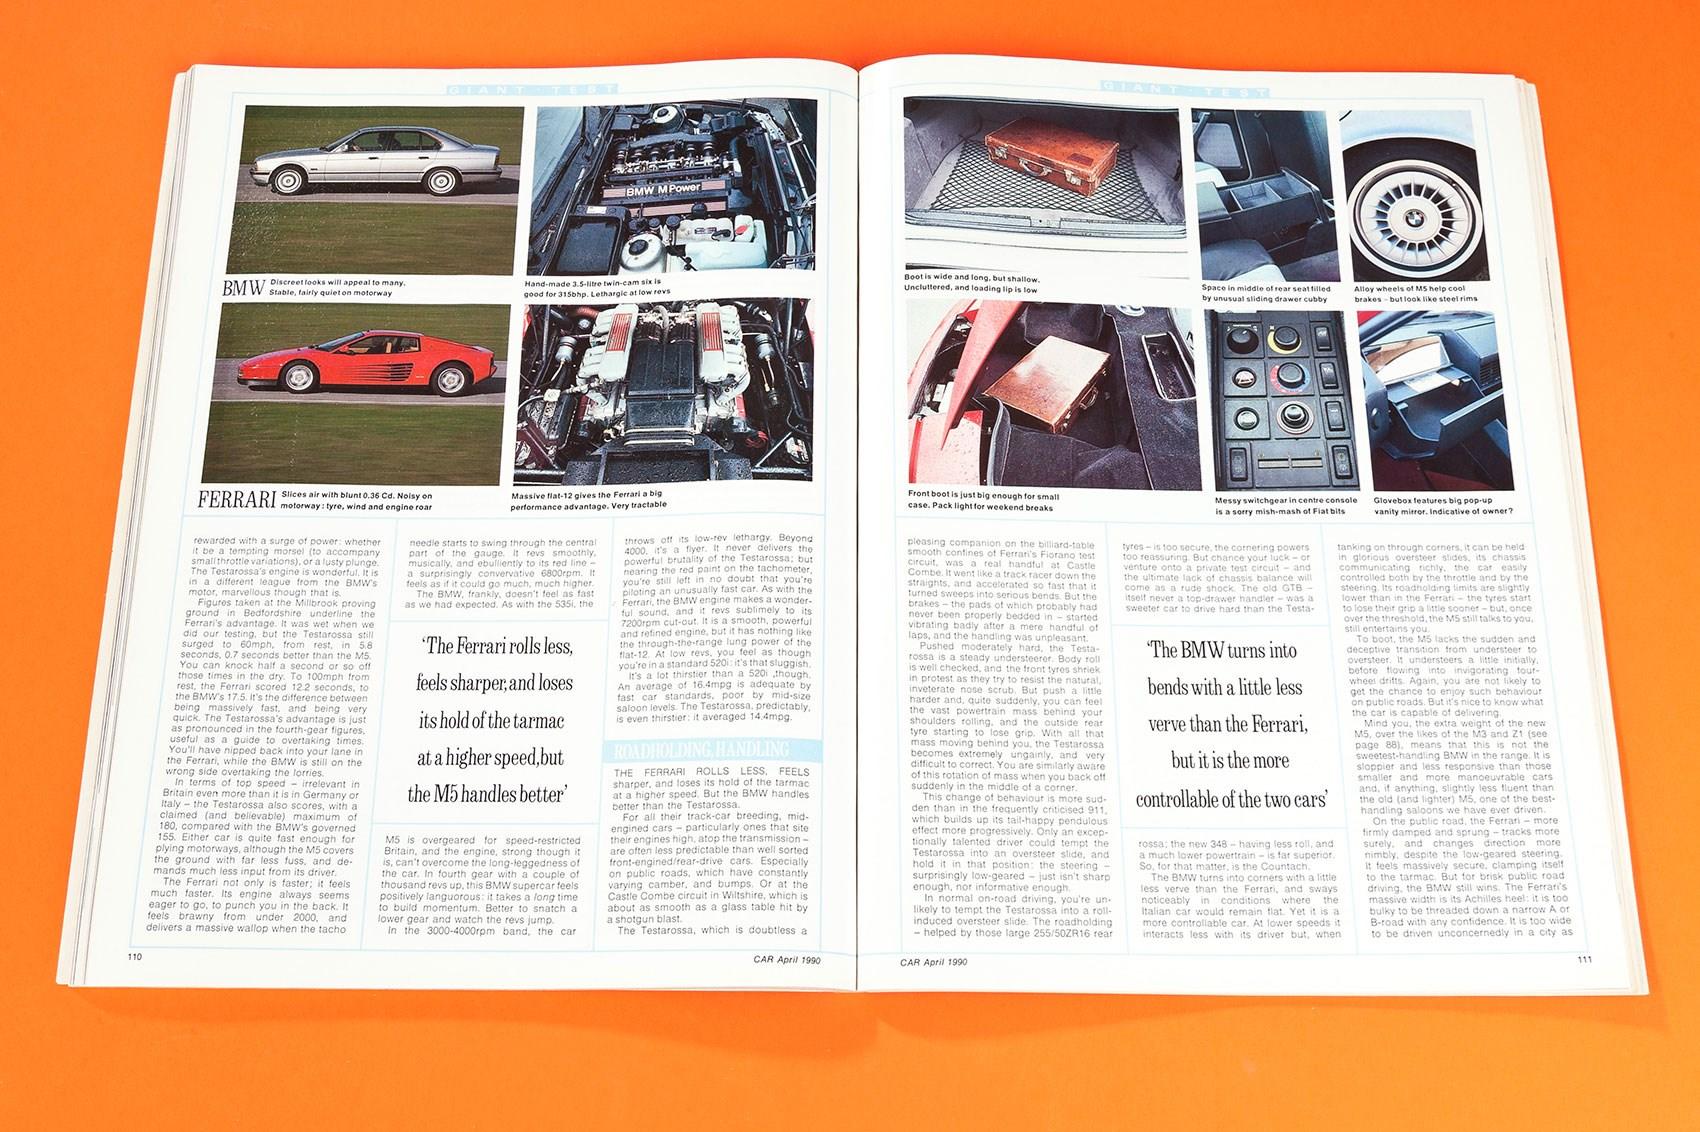 BMW E34 M5 vs Ferrari Testarossa CAR archive 1990 by CAR Magazine